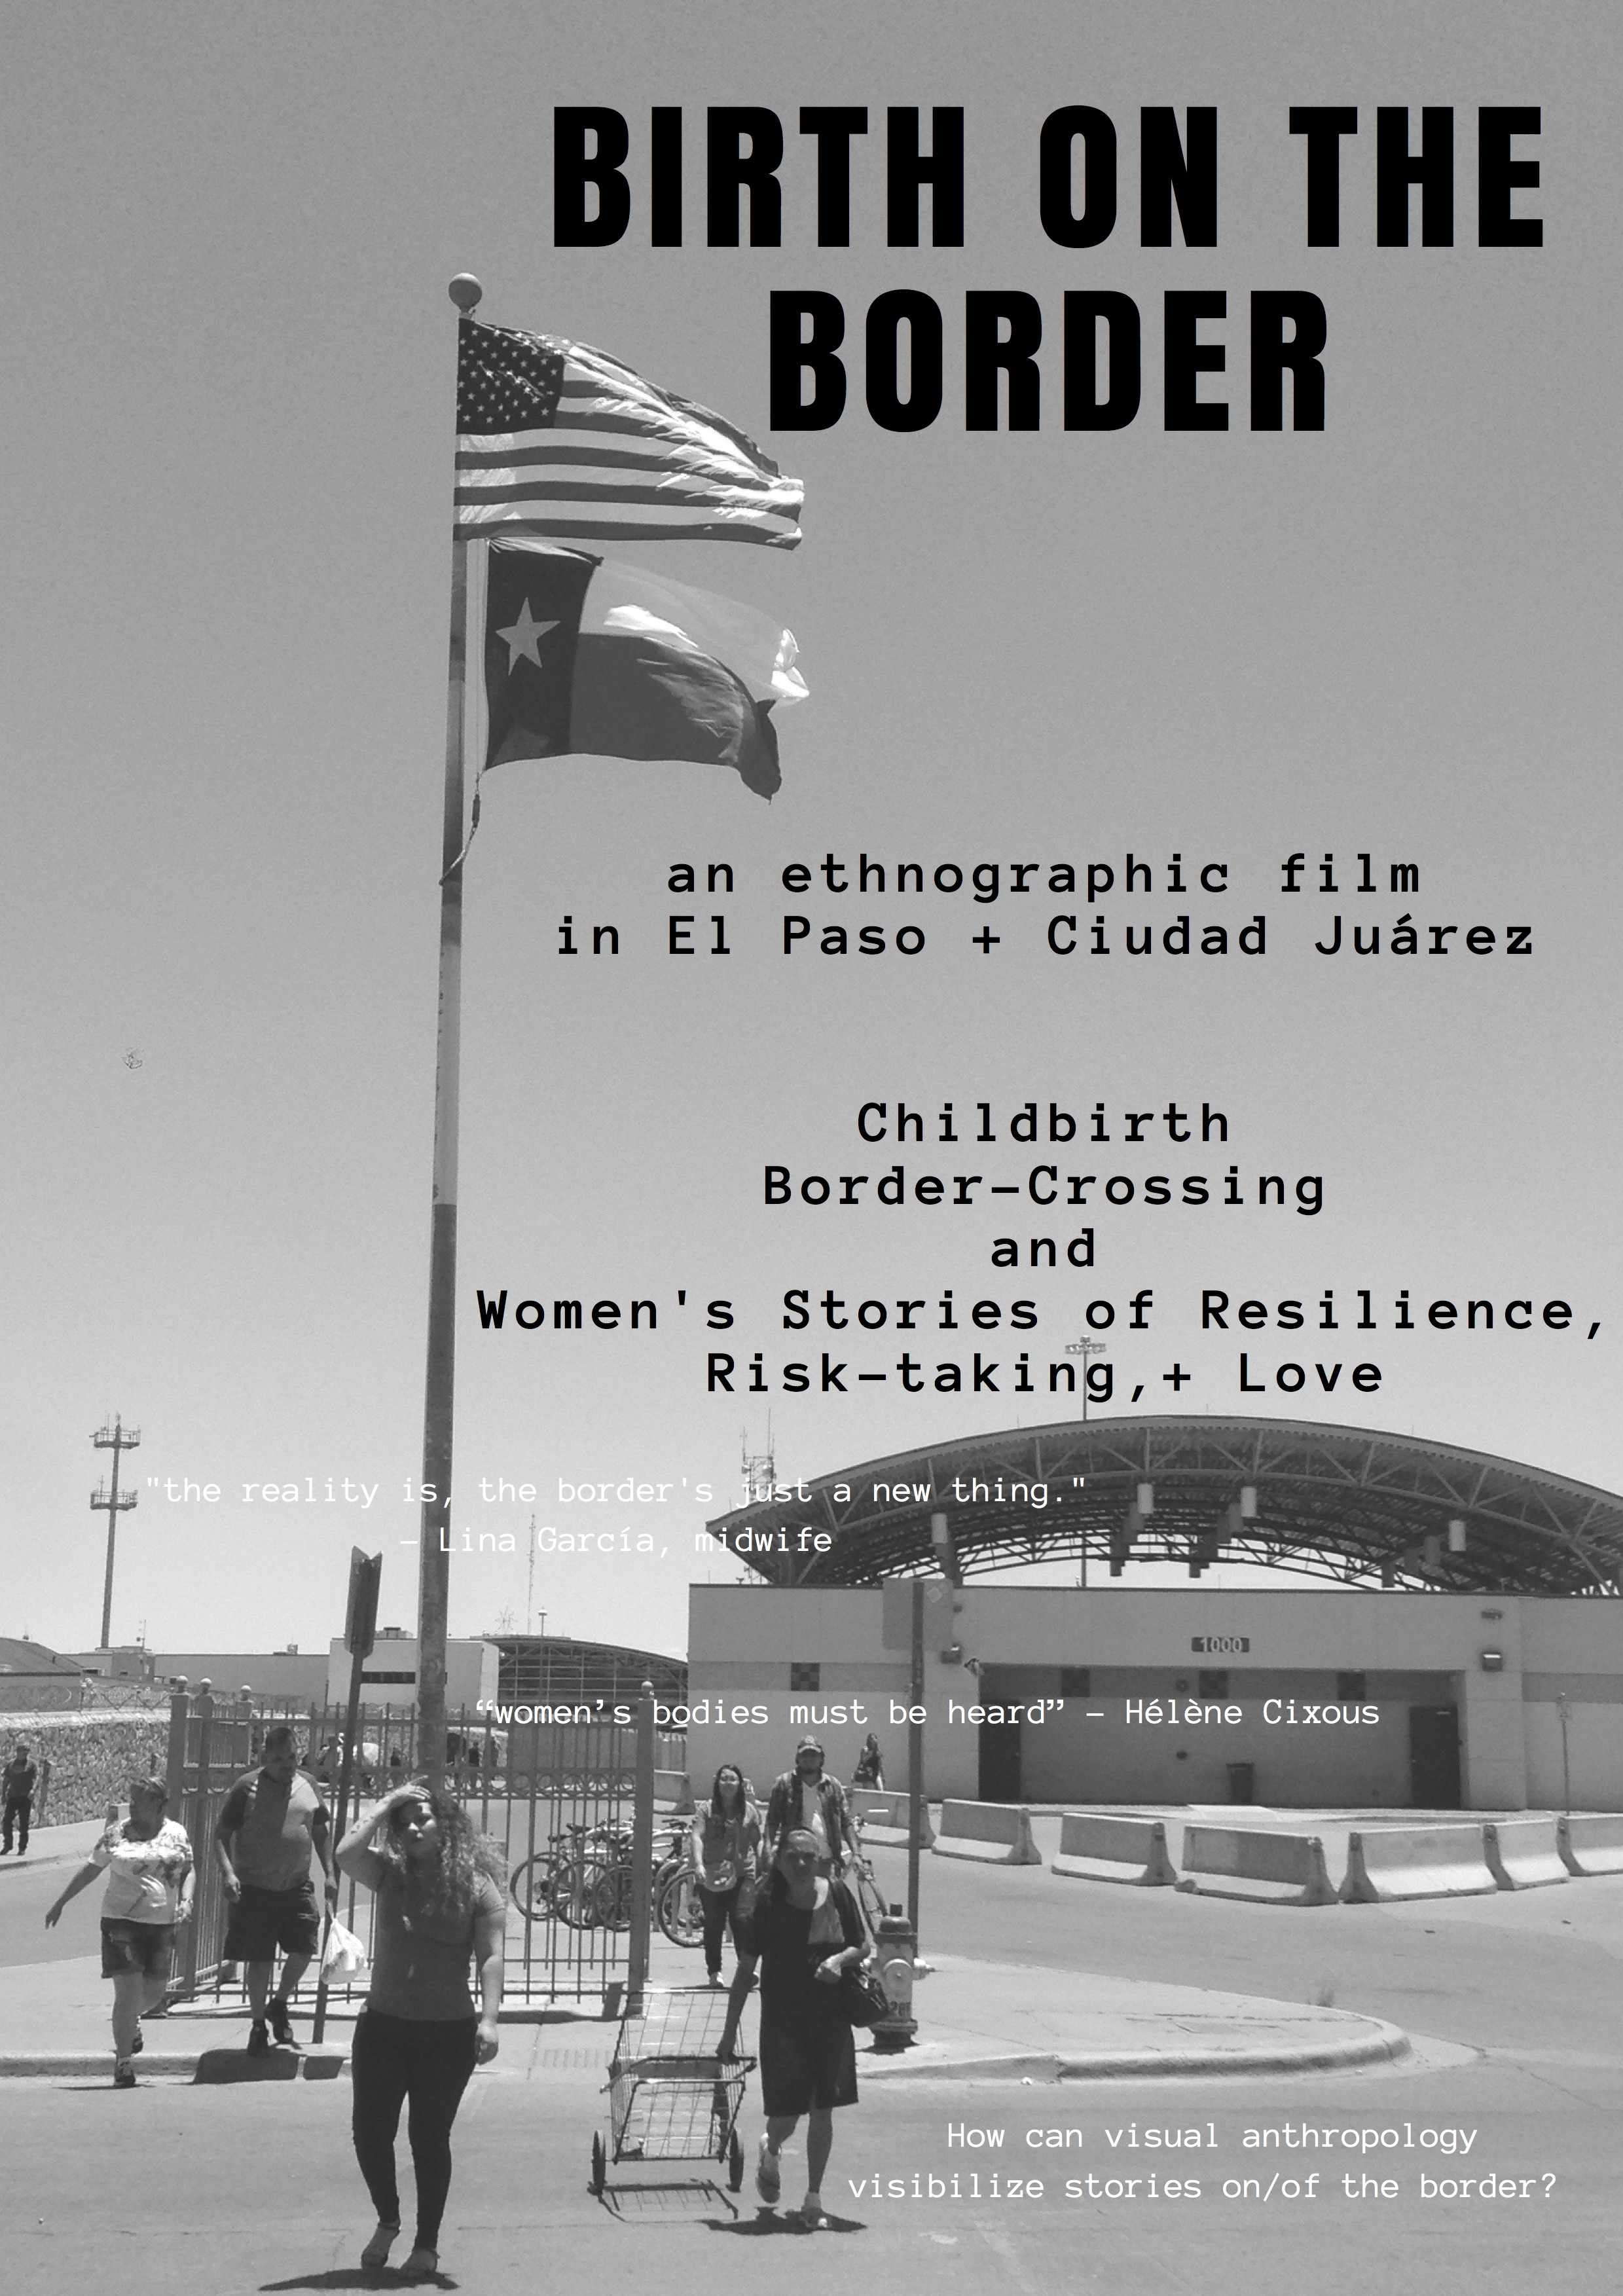 Birth on the Border Film Black and White Poster.jpg